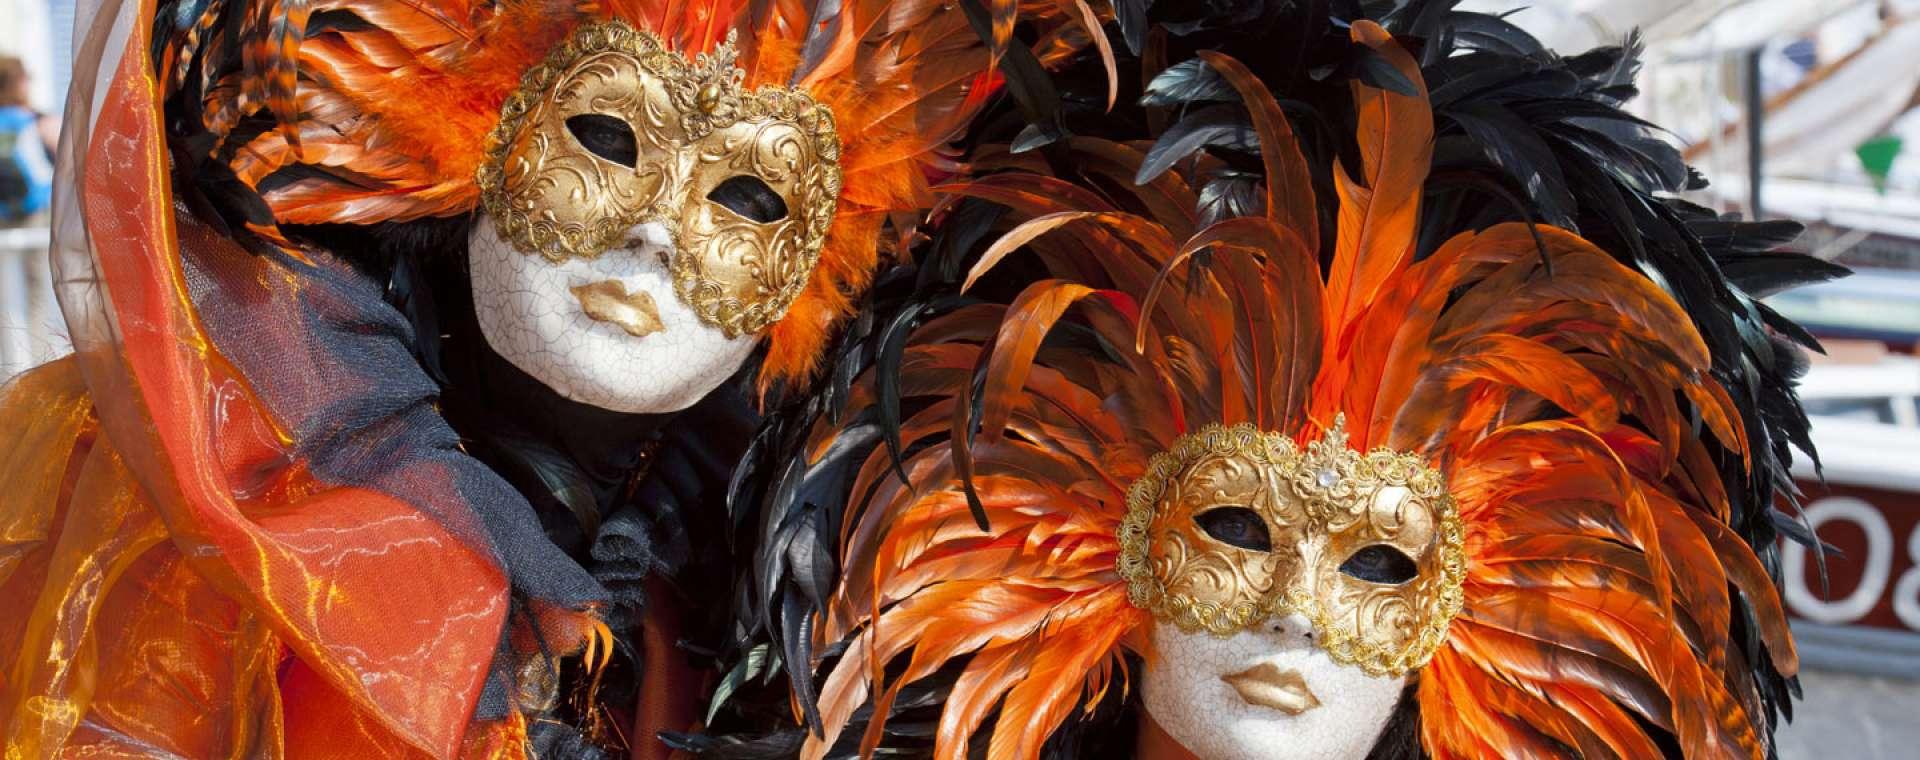 February Festivals in Italy